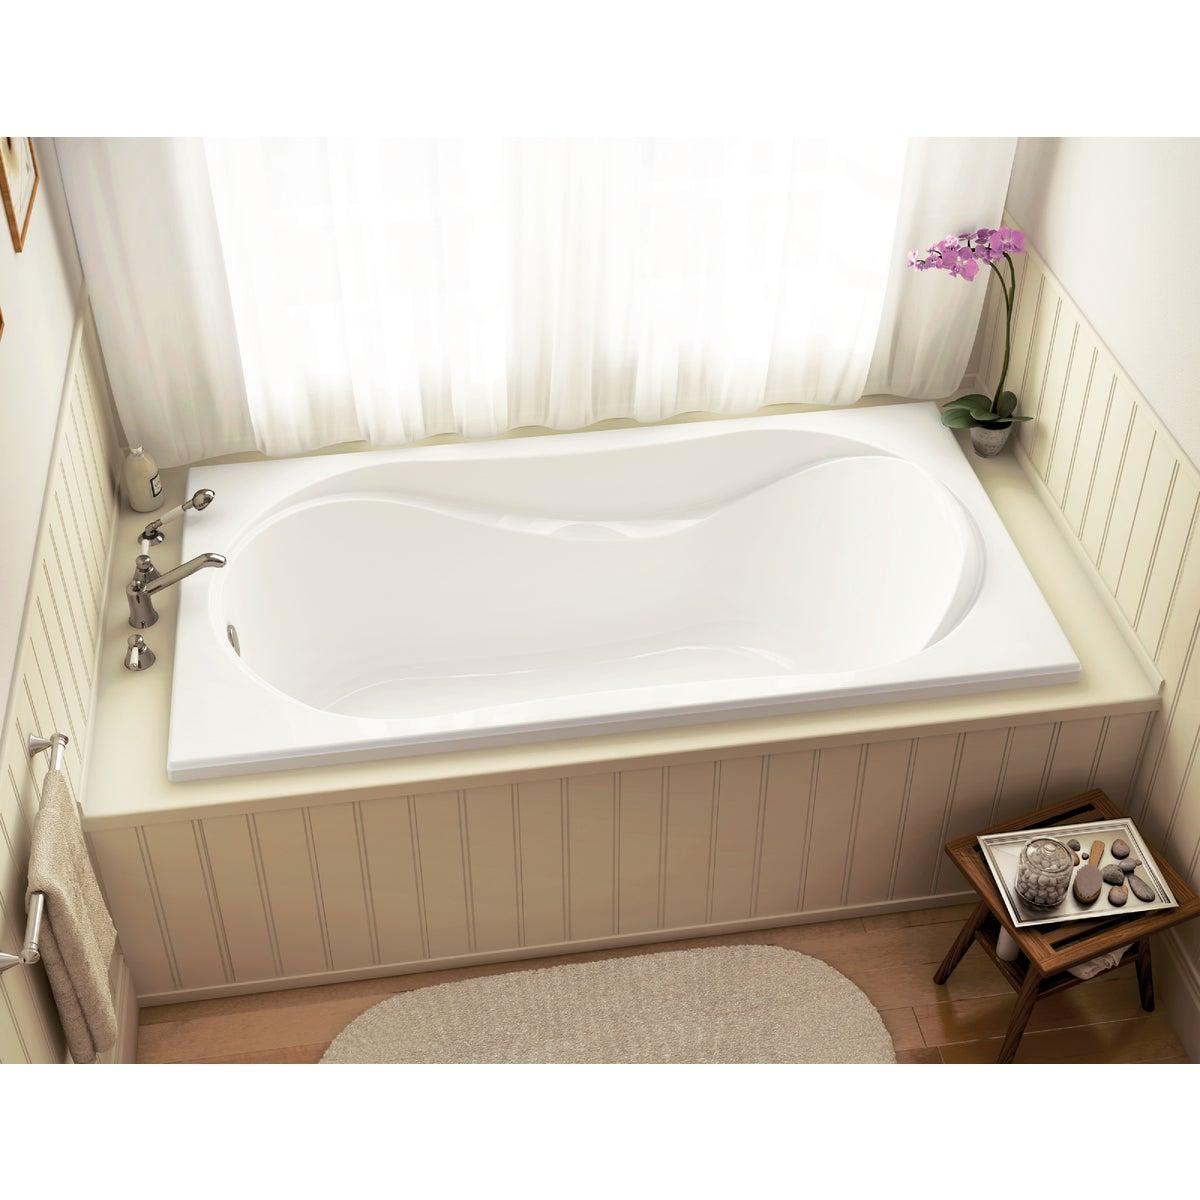 WHITE 10JET WHIRLPOOL - 102722-091-001 by Maax Bath